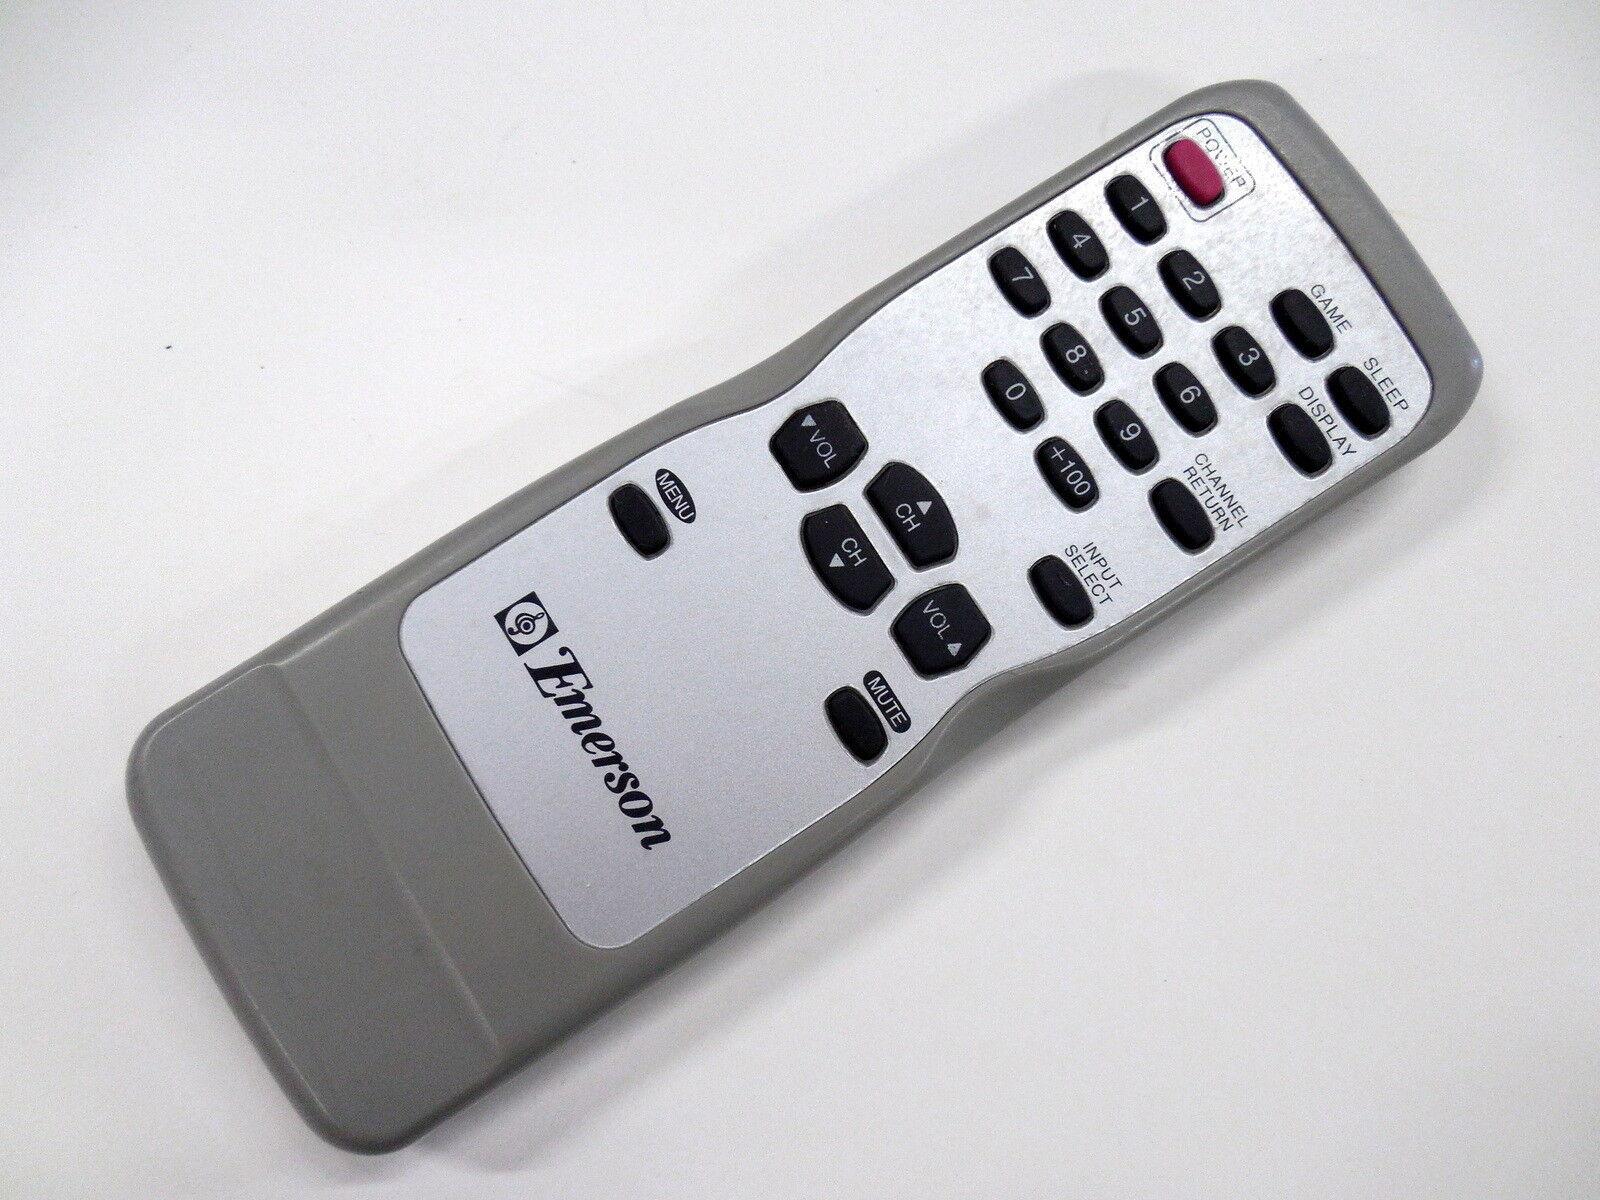 100+ Emerson Remote Control Com Www – yasminroohi